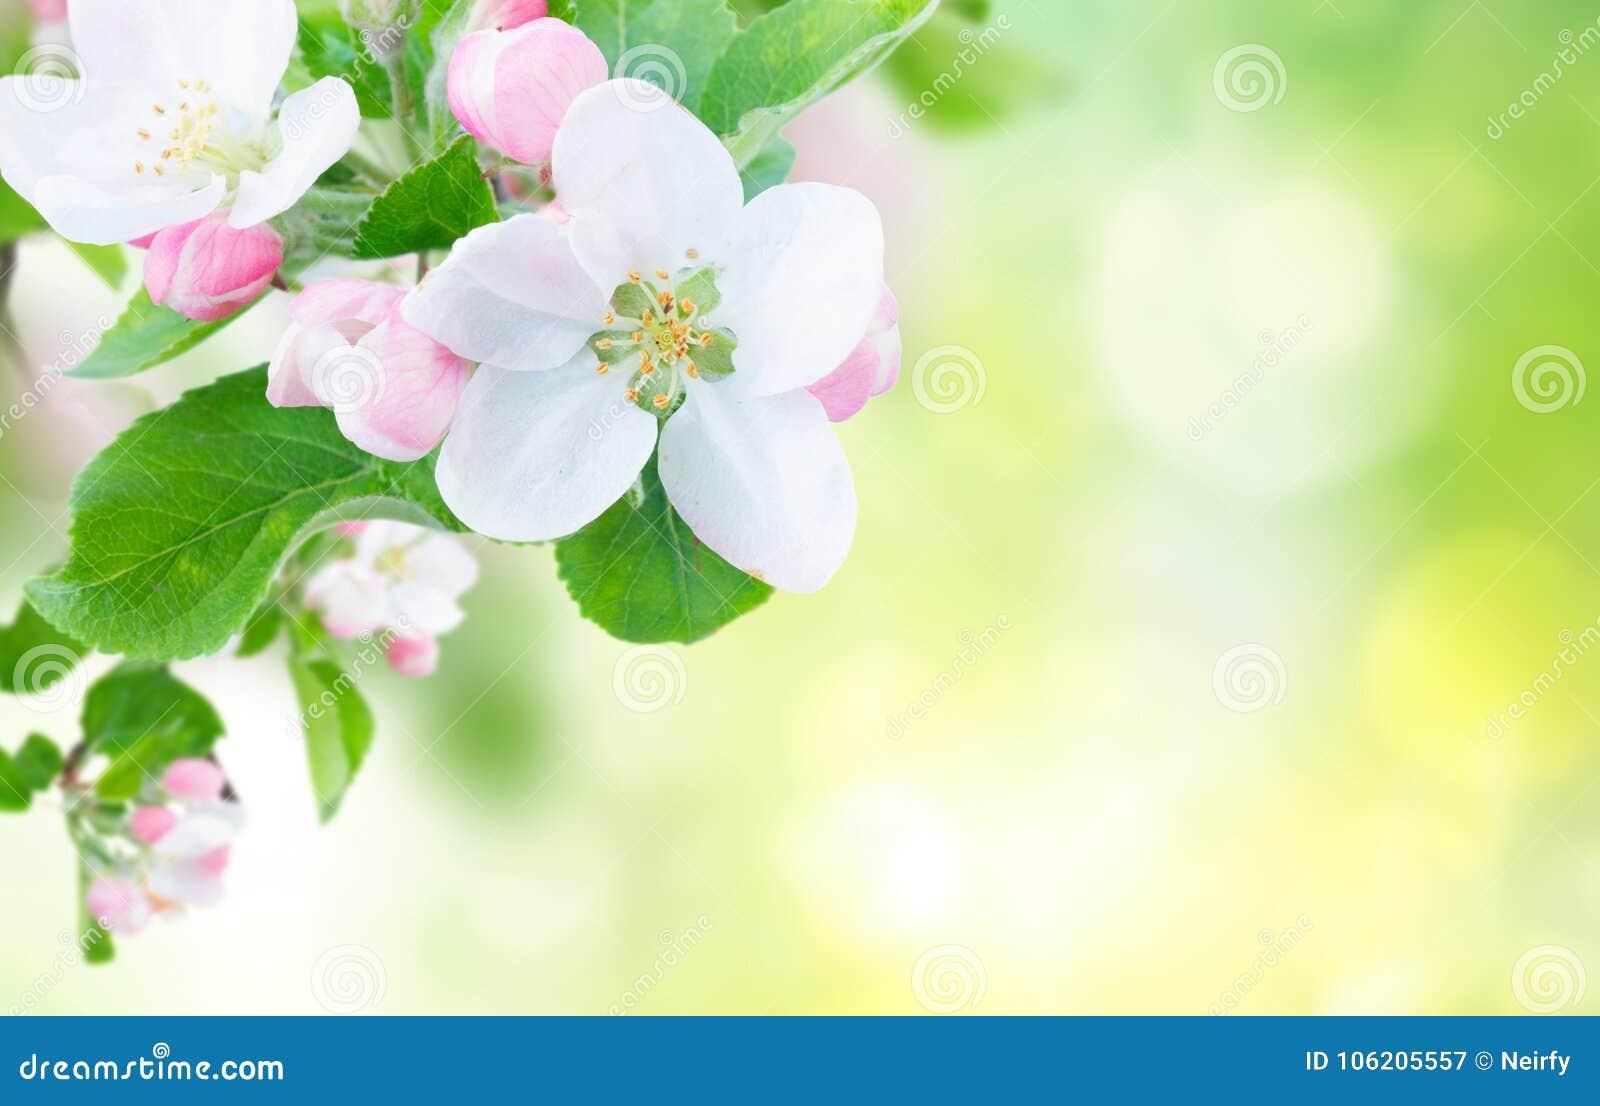 Flor da árvore de Apple